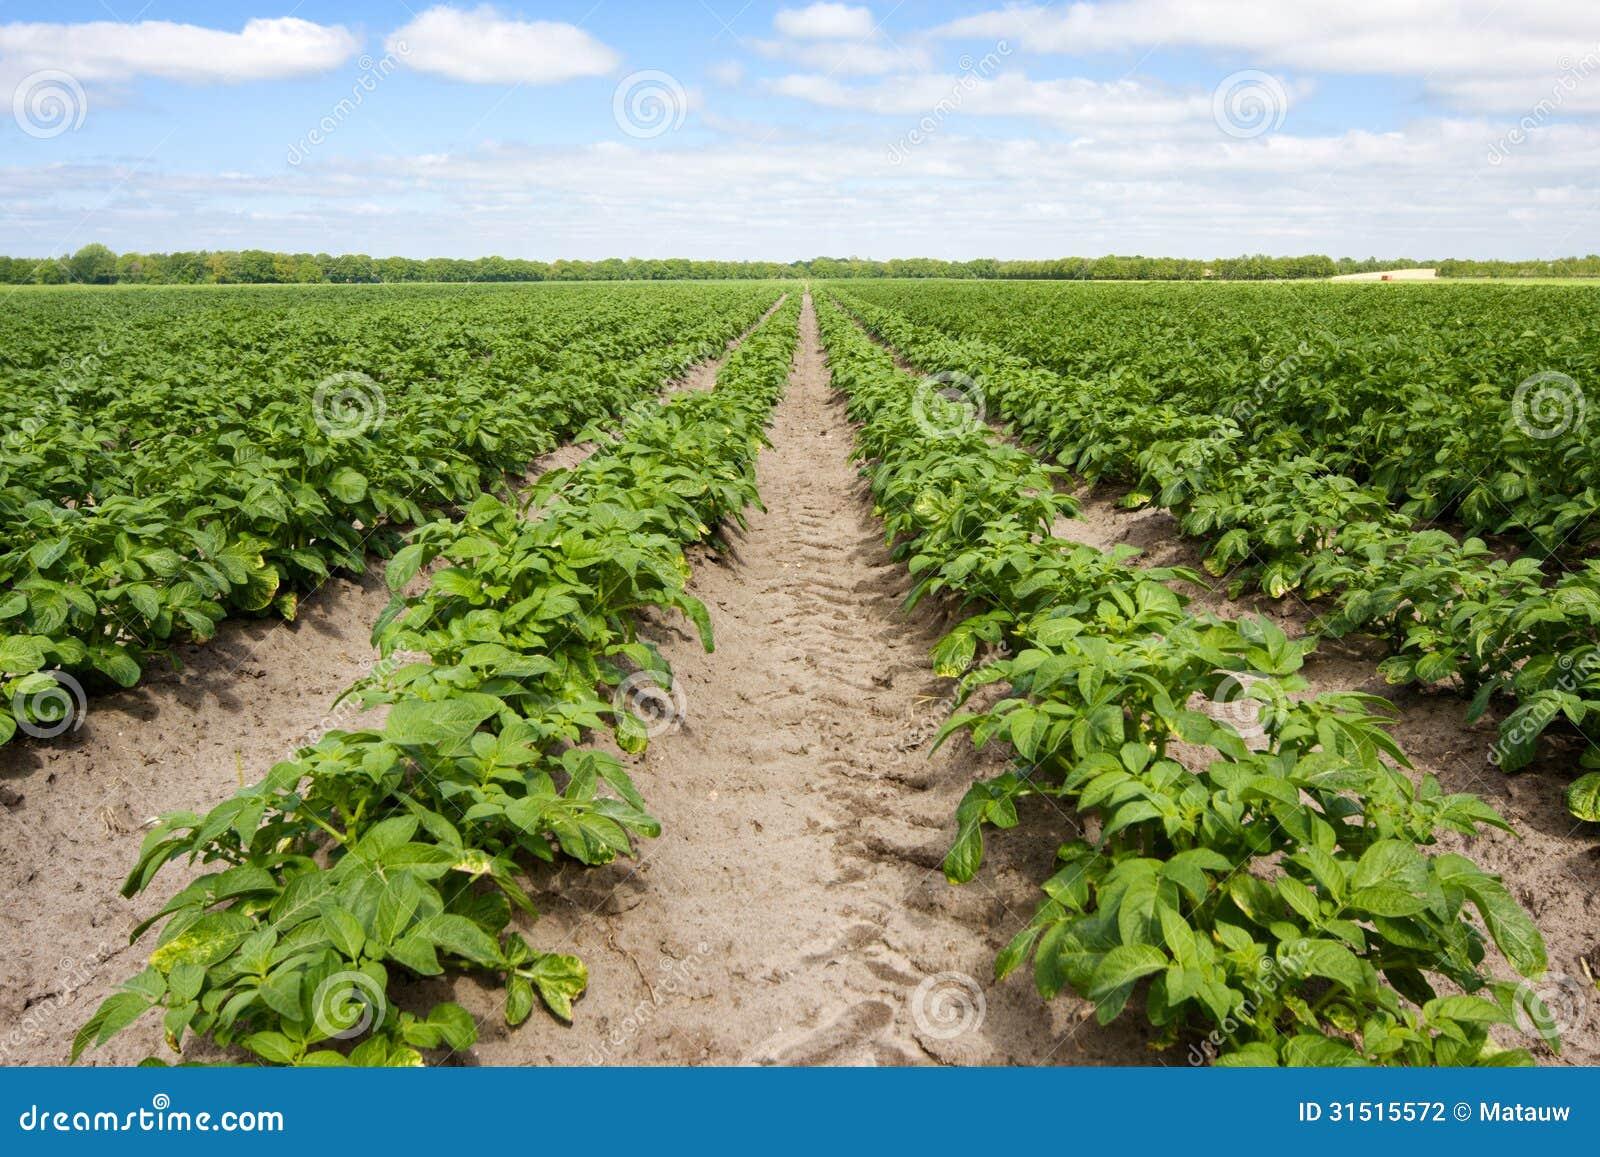 Potato field stock photo. Image of vegetable, industrial ...